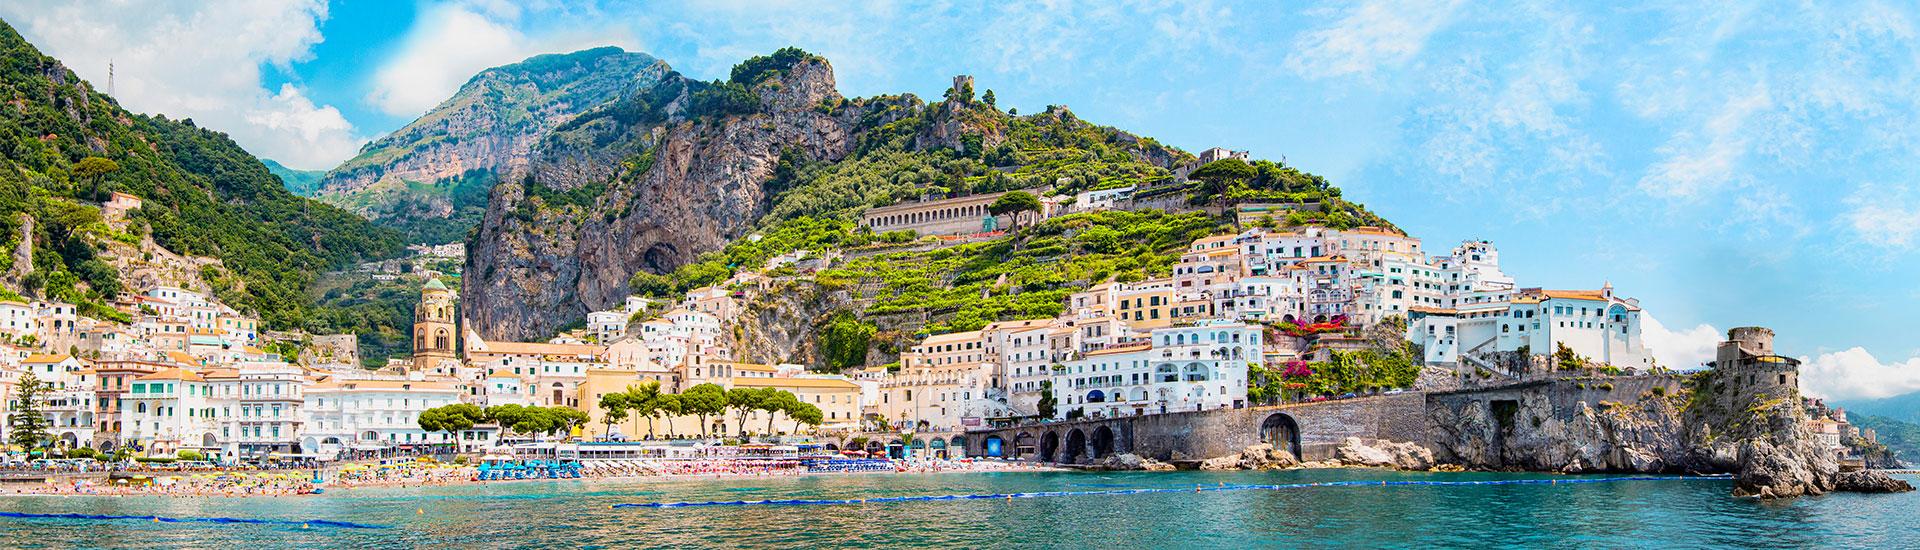 Hotels Amalfi Coast hero